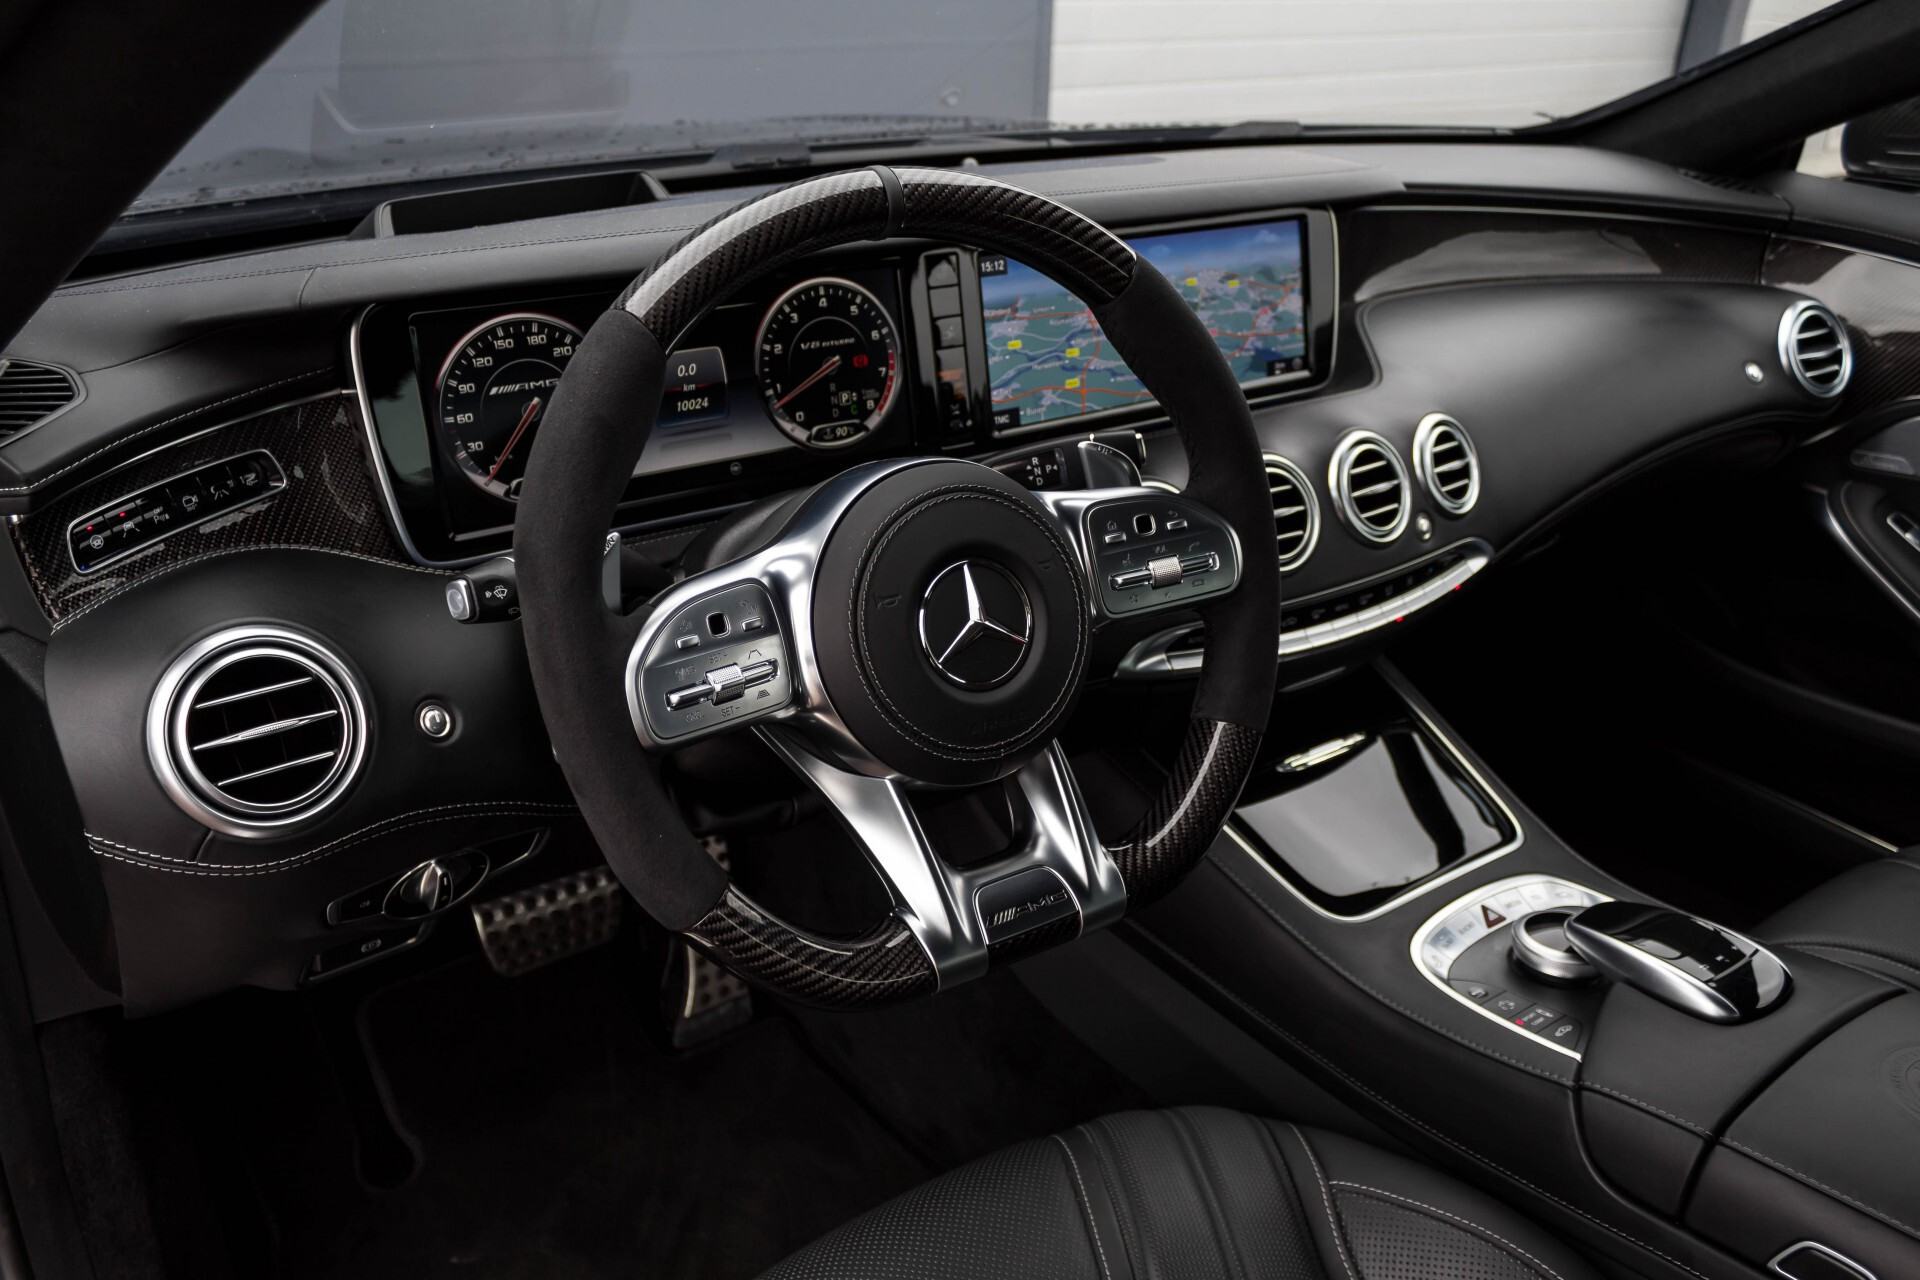 Mercedes-Benz S-Klasse Cabrio 63 AMG 4-M Ceramic/Designo/Carbon/Burmester High End Aut Foto 26